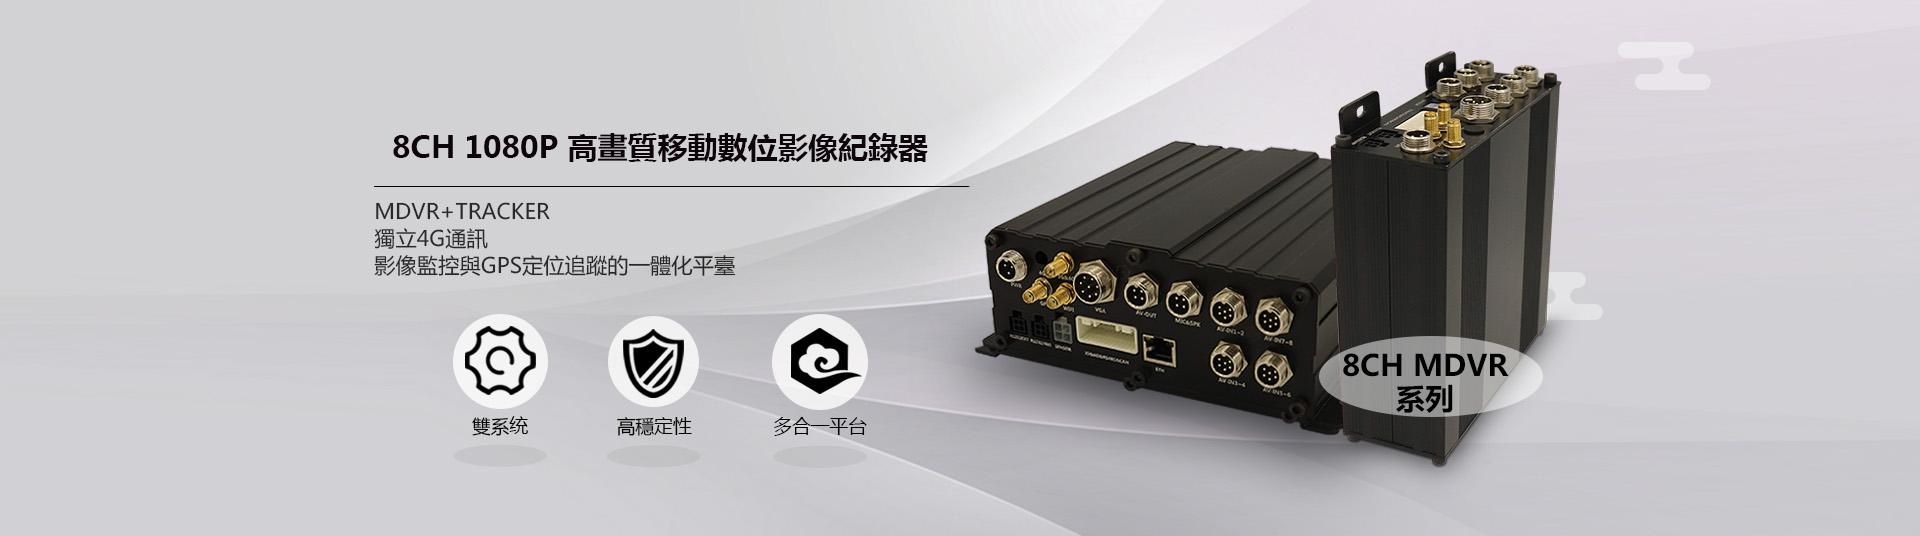 8CH-MDVR-Series_tw